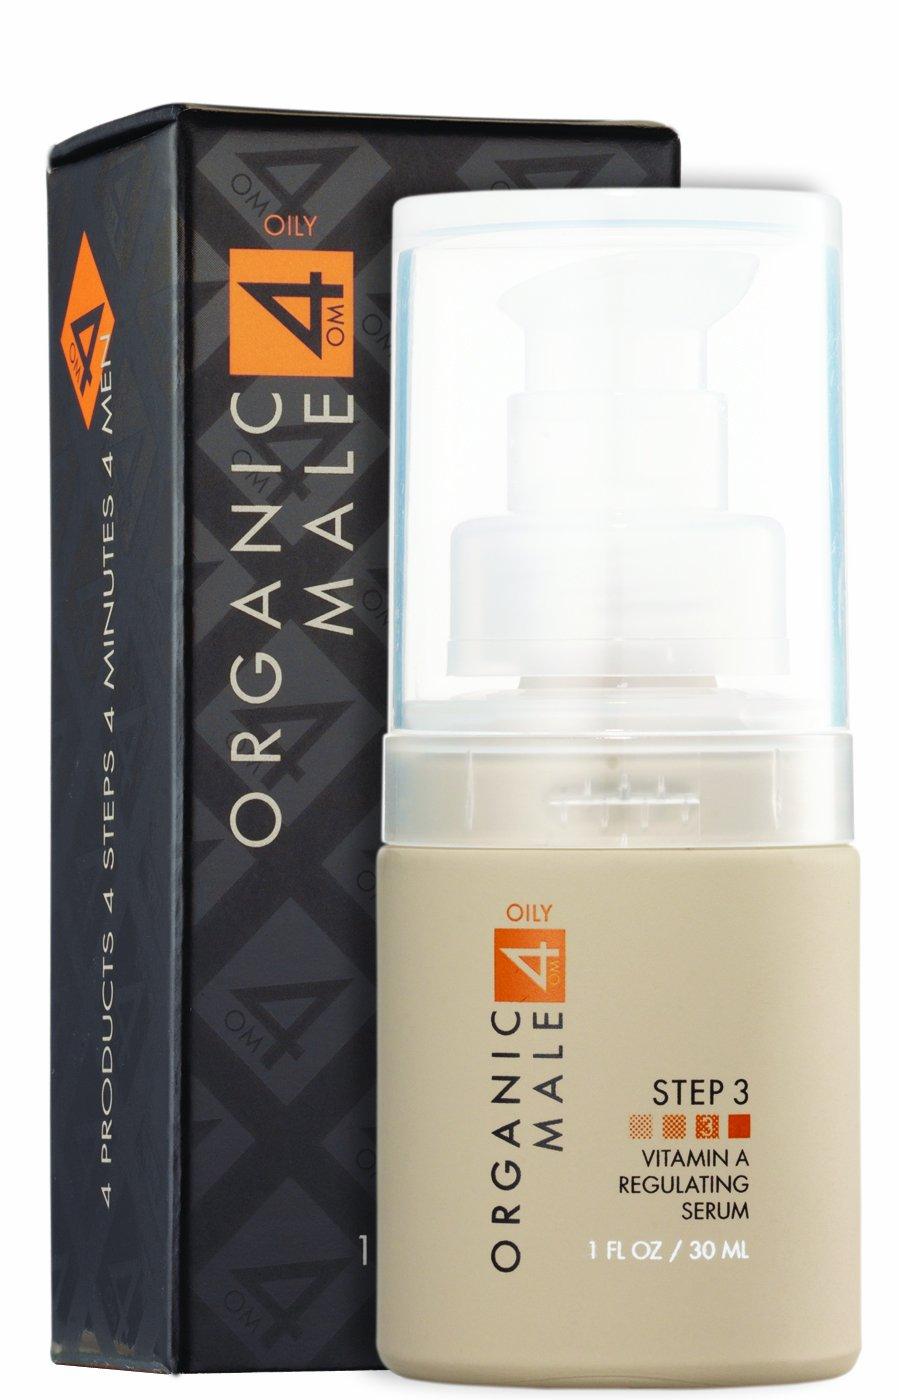 Organic Male OM4 Oily Step 3: Vitamin A Regulating Serum (1.0 oz) Organic & Natural Serum for Oily Skin Types